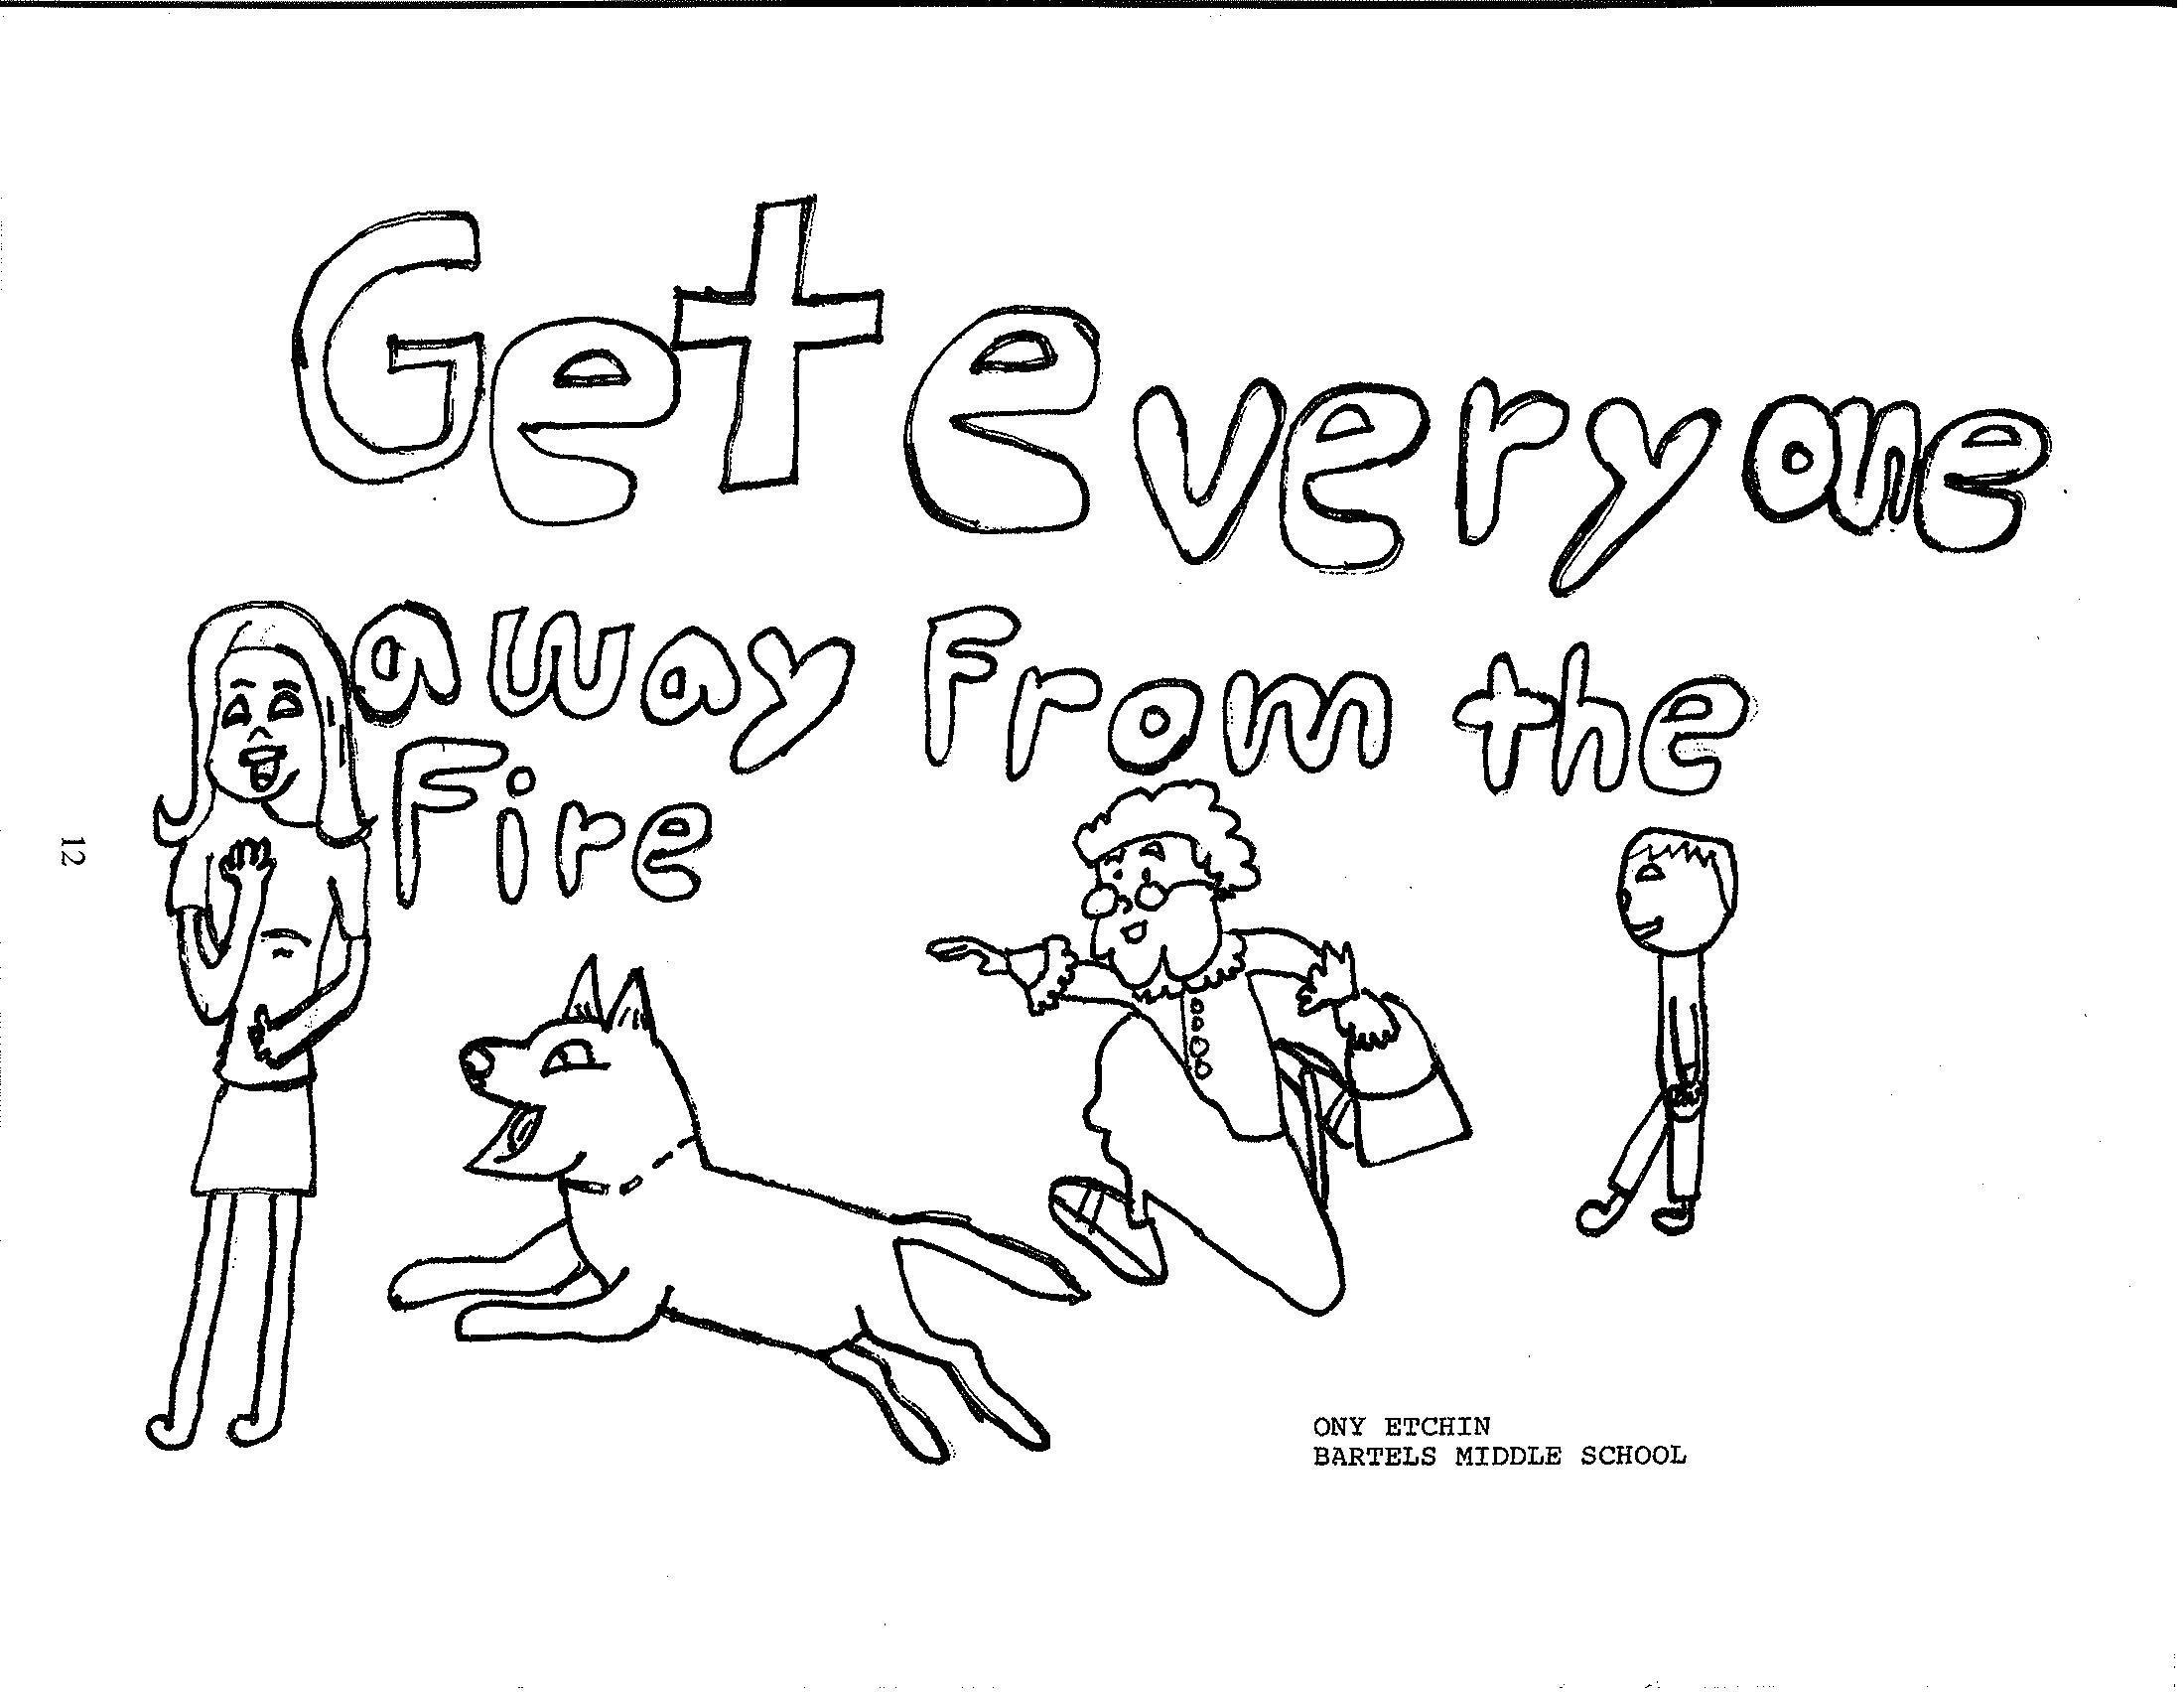 Chester Sroka Fire Prevention Fund